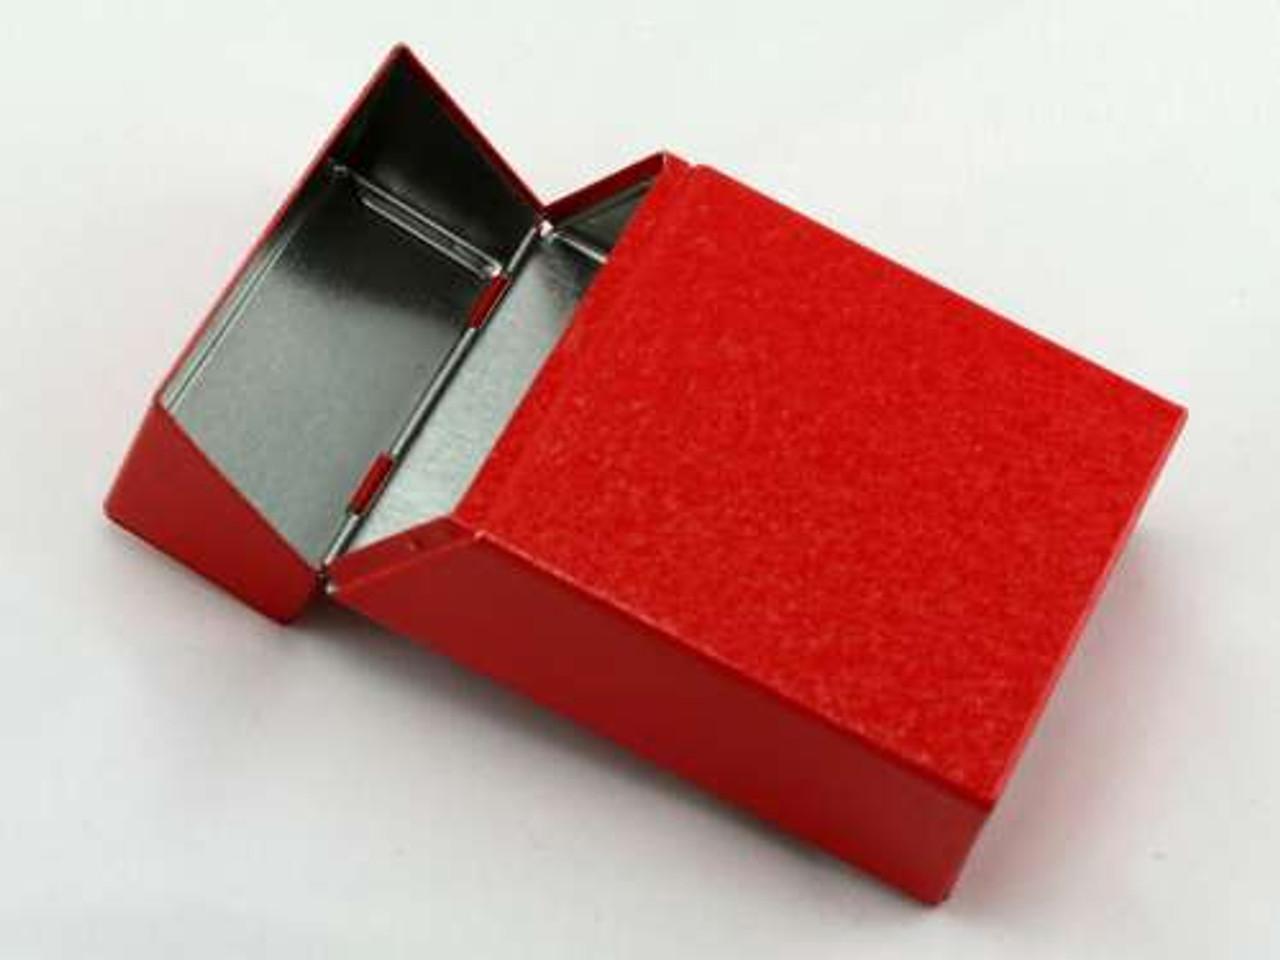 Red PC Cigarette Pack Holder